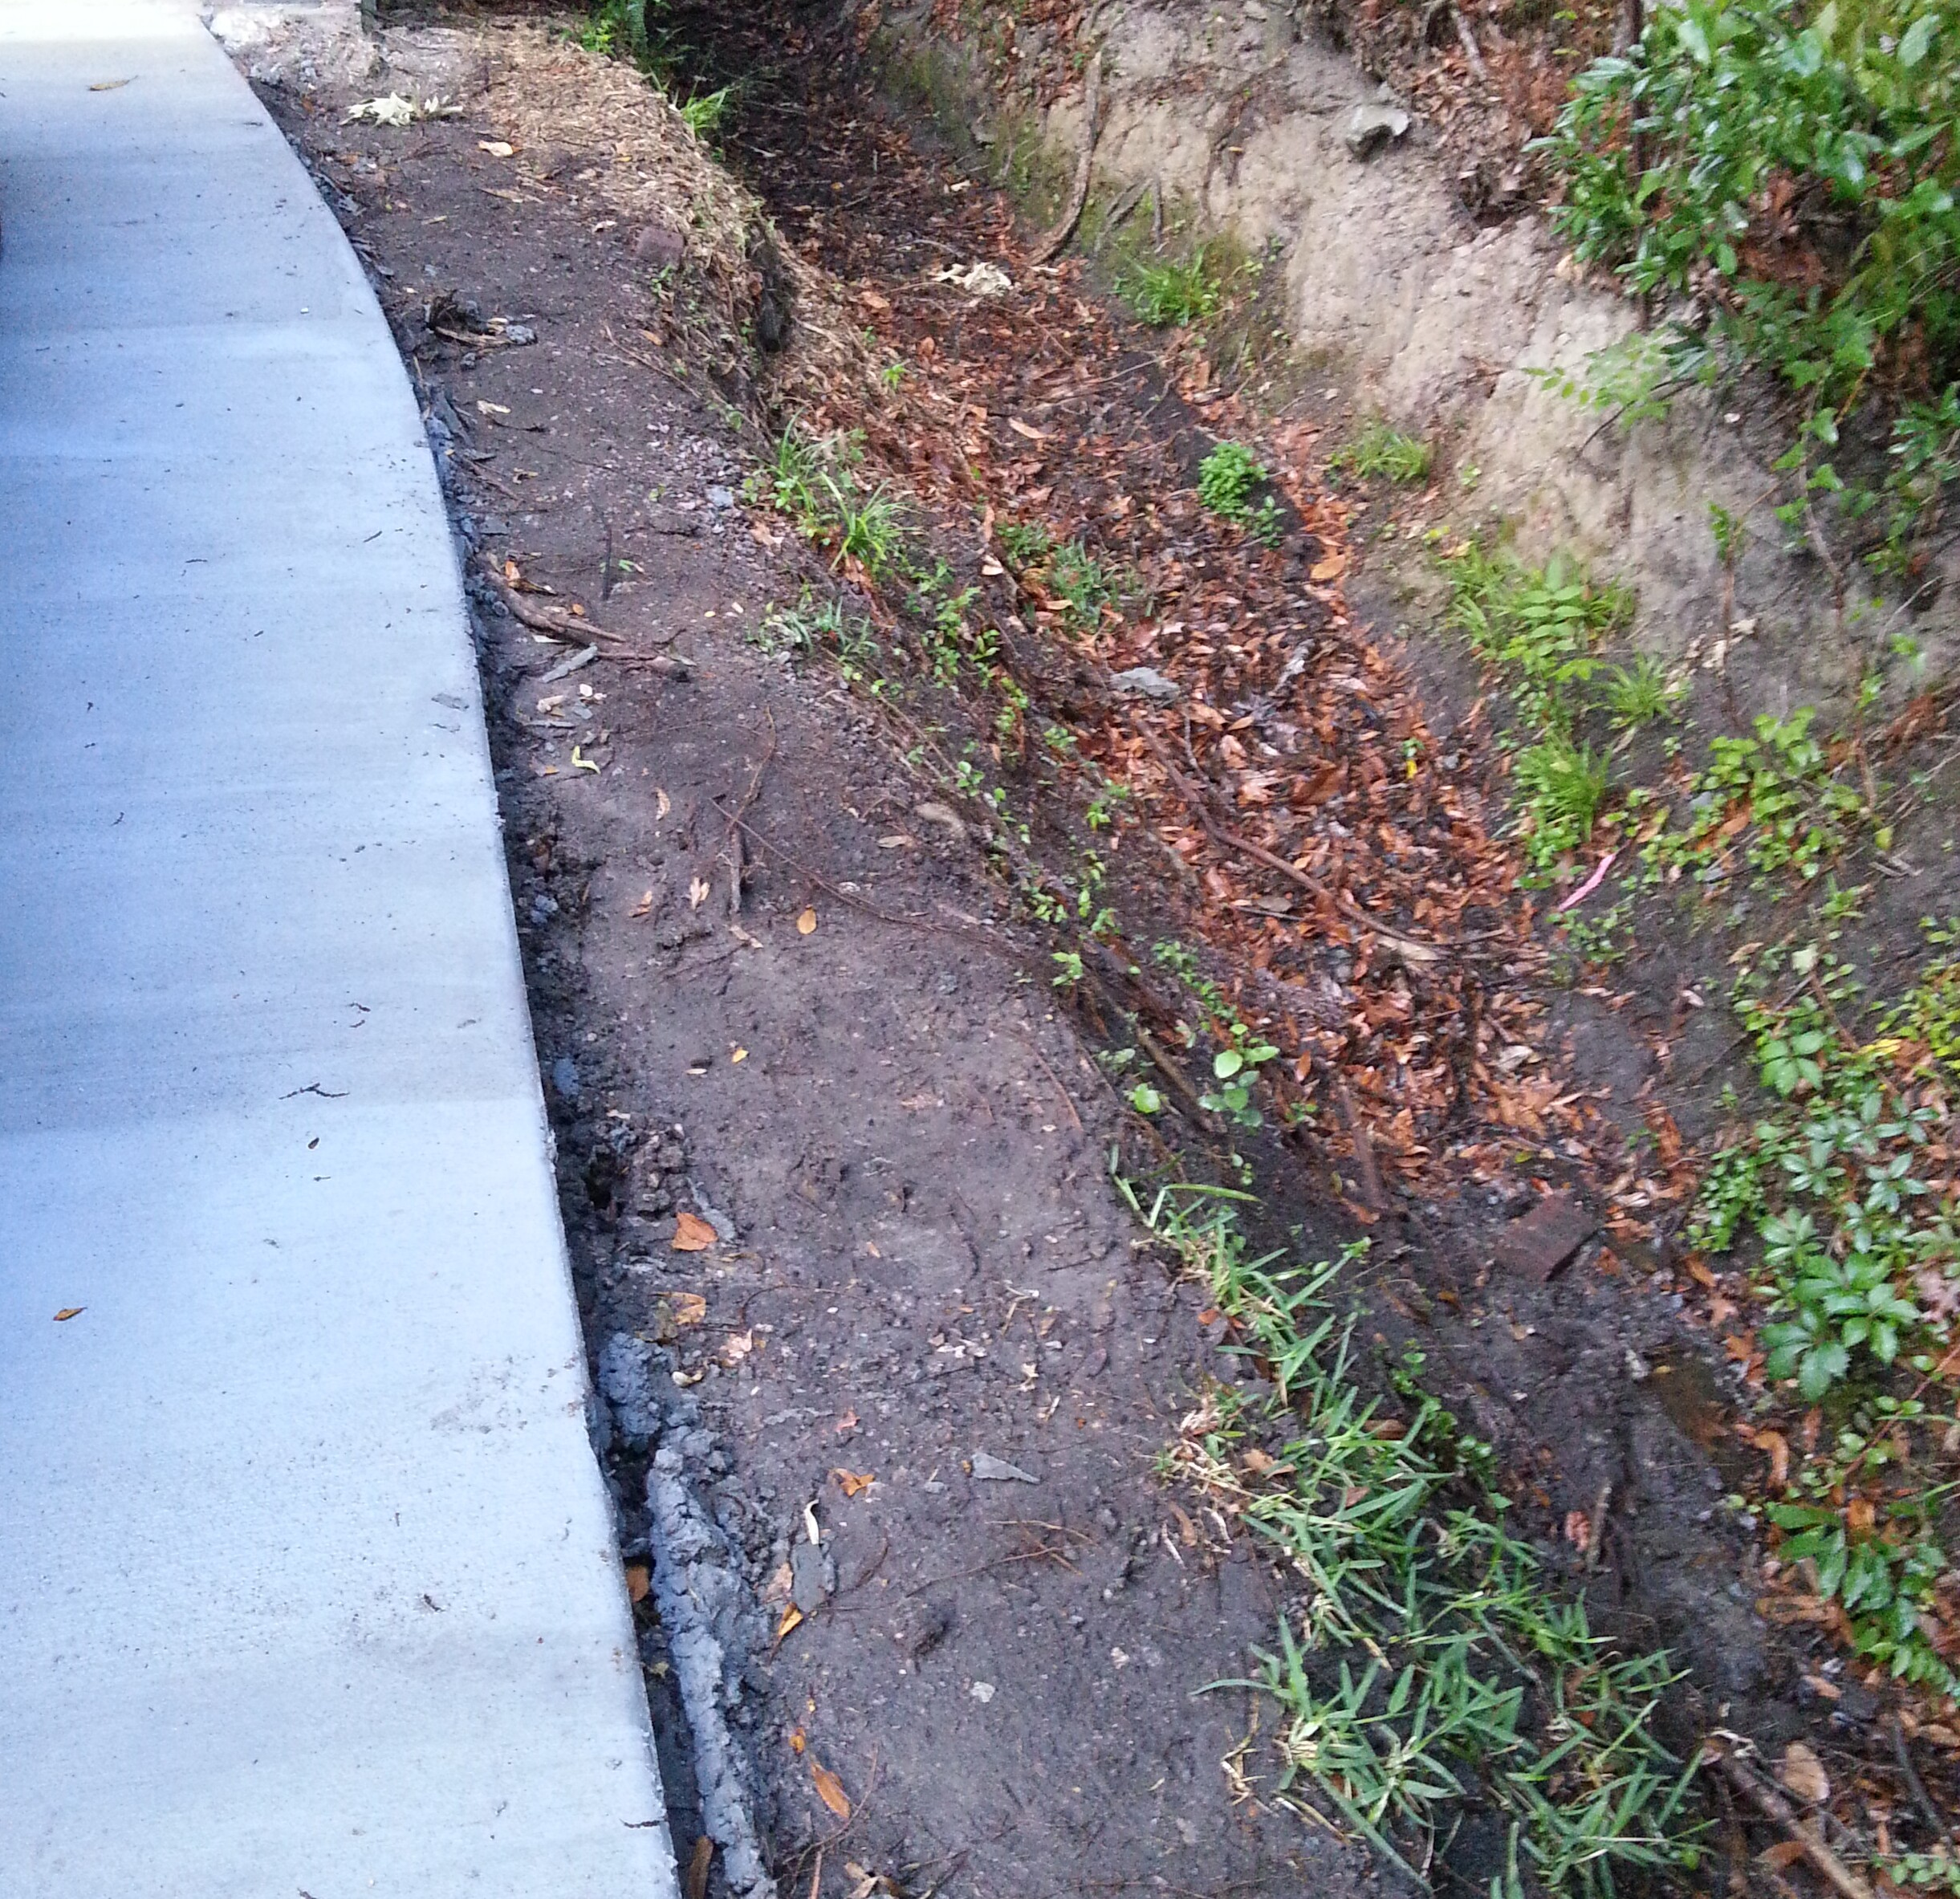 driveway water runoff problem drain installing pipe